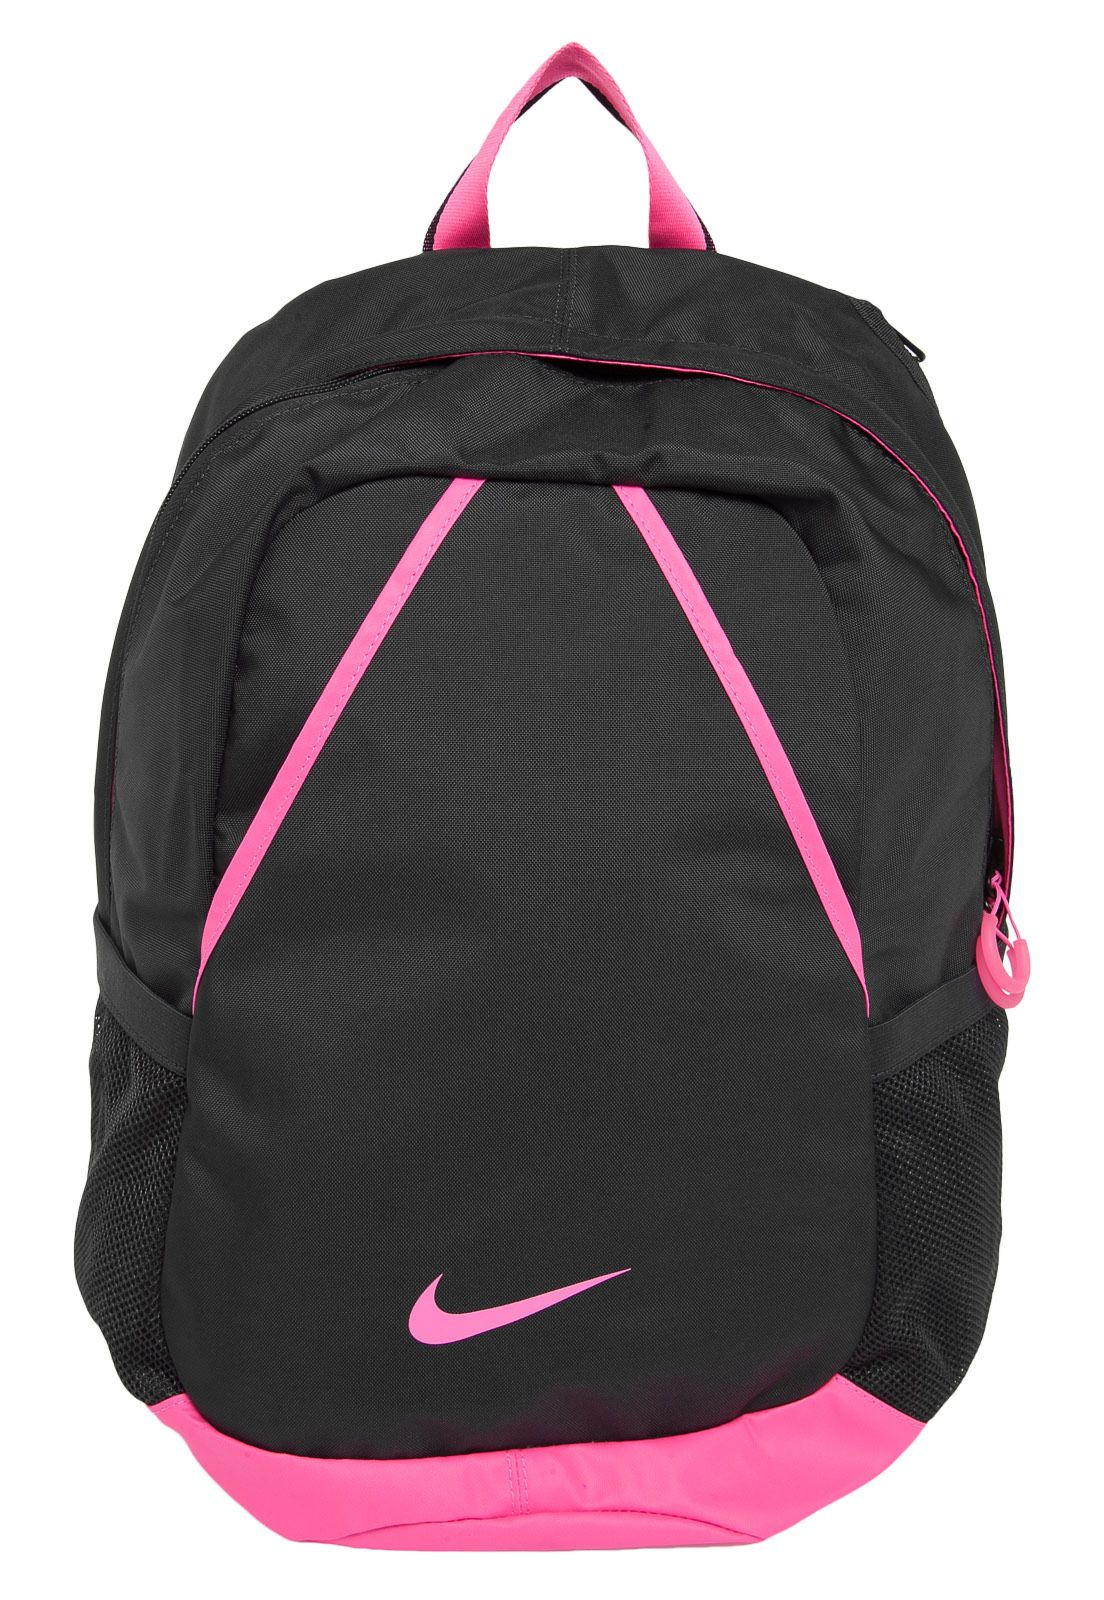 d233382702 Mochila Nike Varsity Preta - Marca Nike